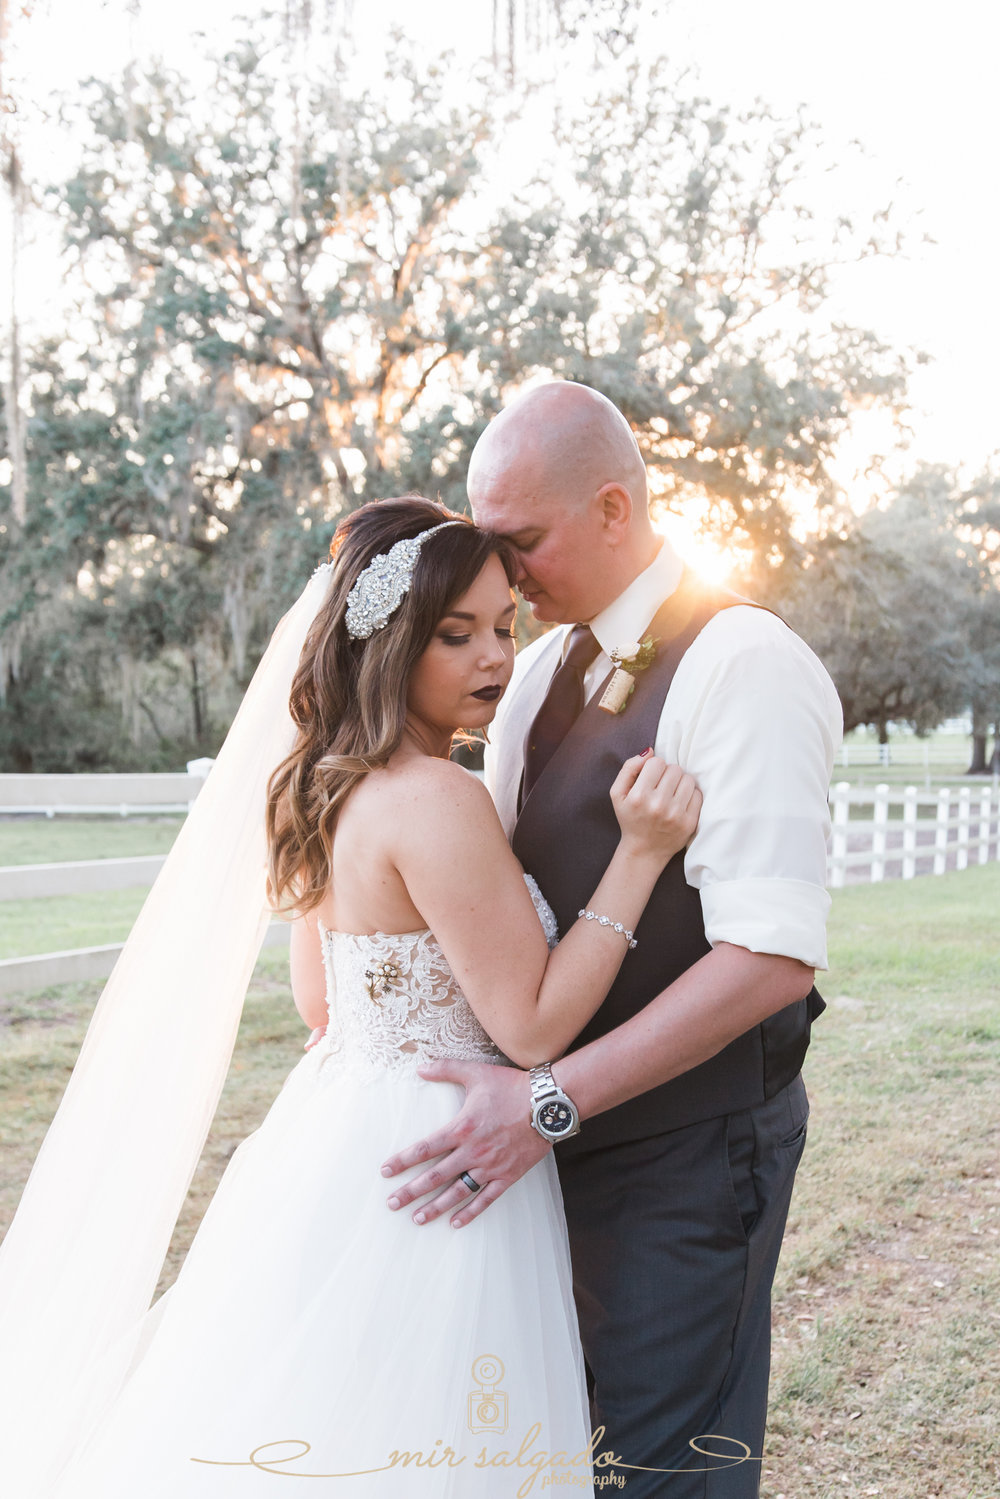 The-Lange-farm-wedding, Tampa-wedding-photography, bride-and-groom-photo